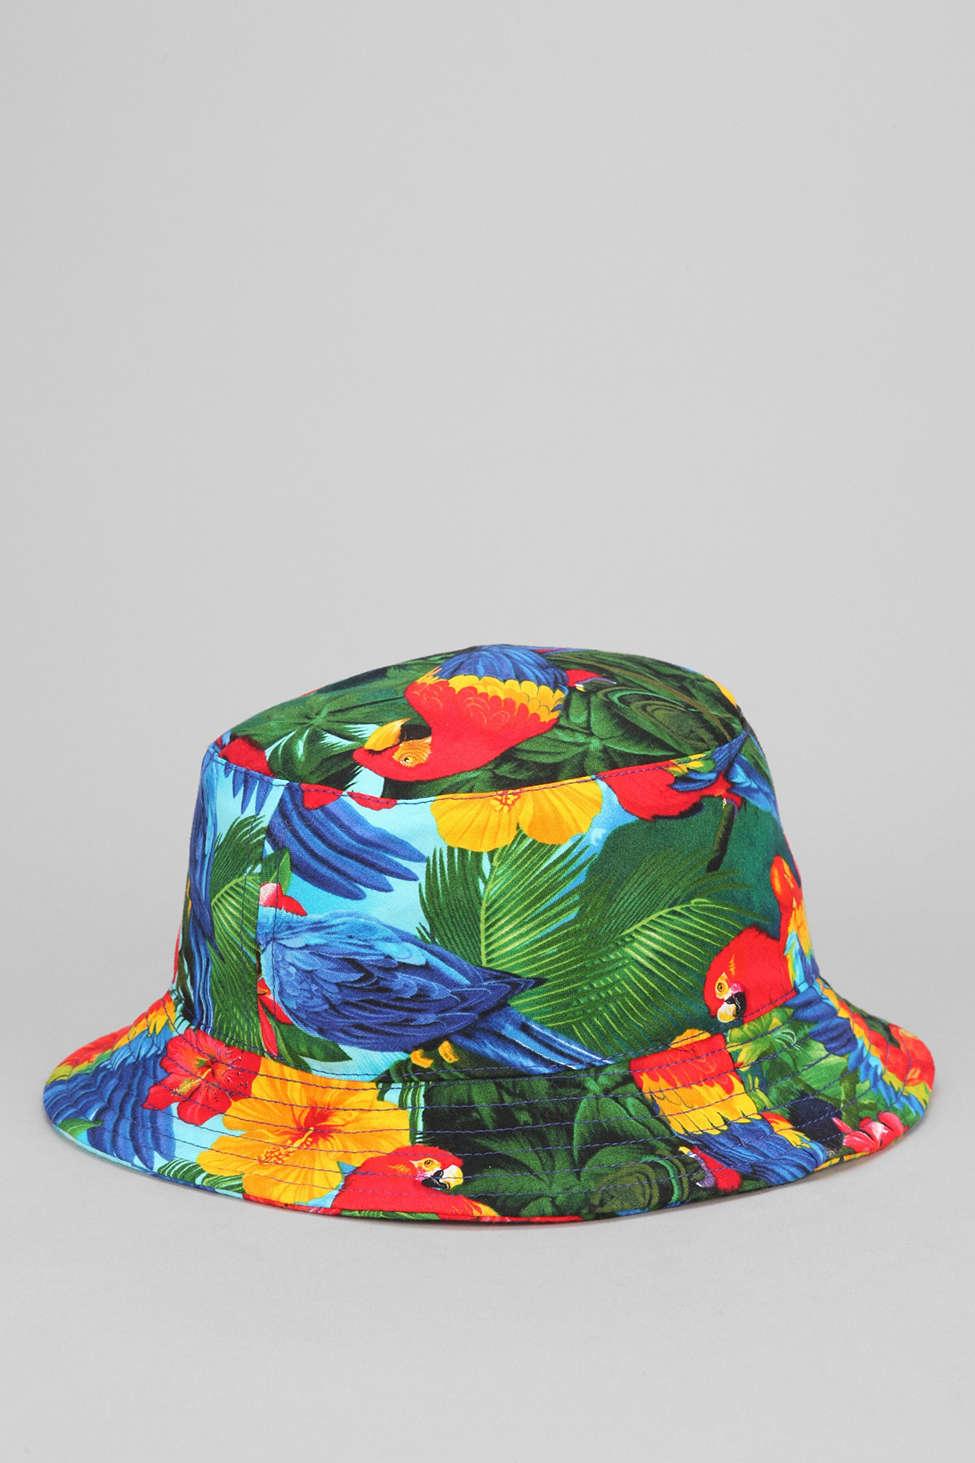 5fc9ca3dc25 ... where can i buy lyst milkcrate athletics tropical bucket hat for men  64de5 9a964 ...